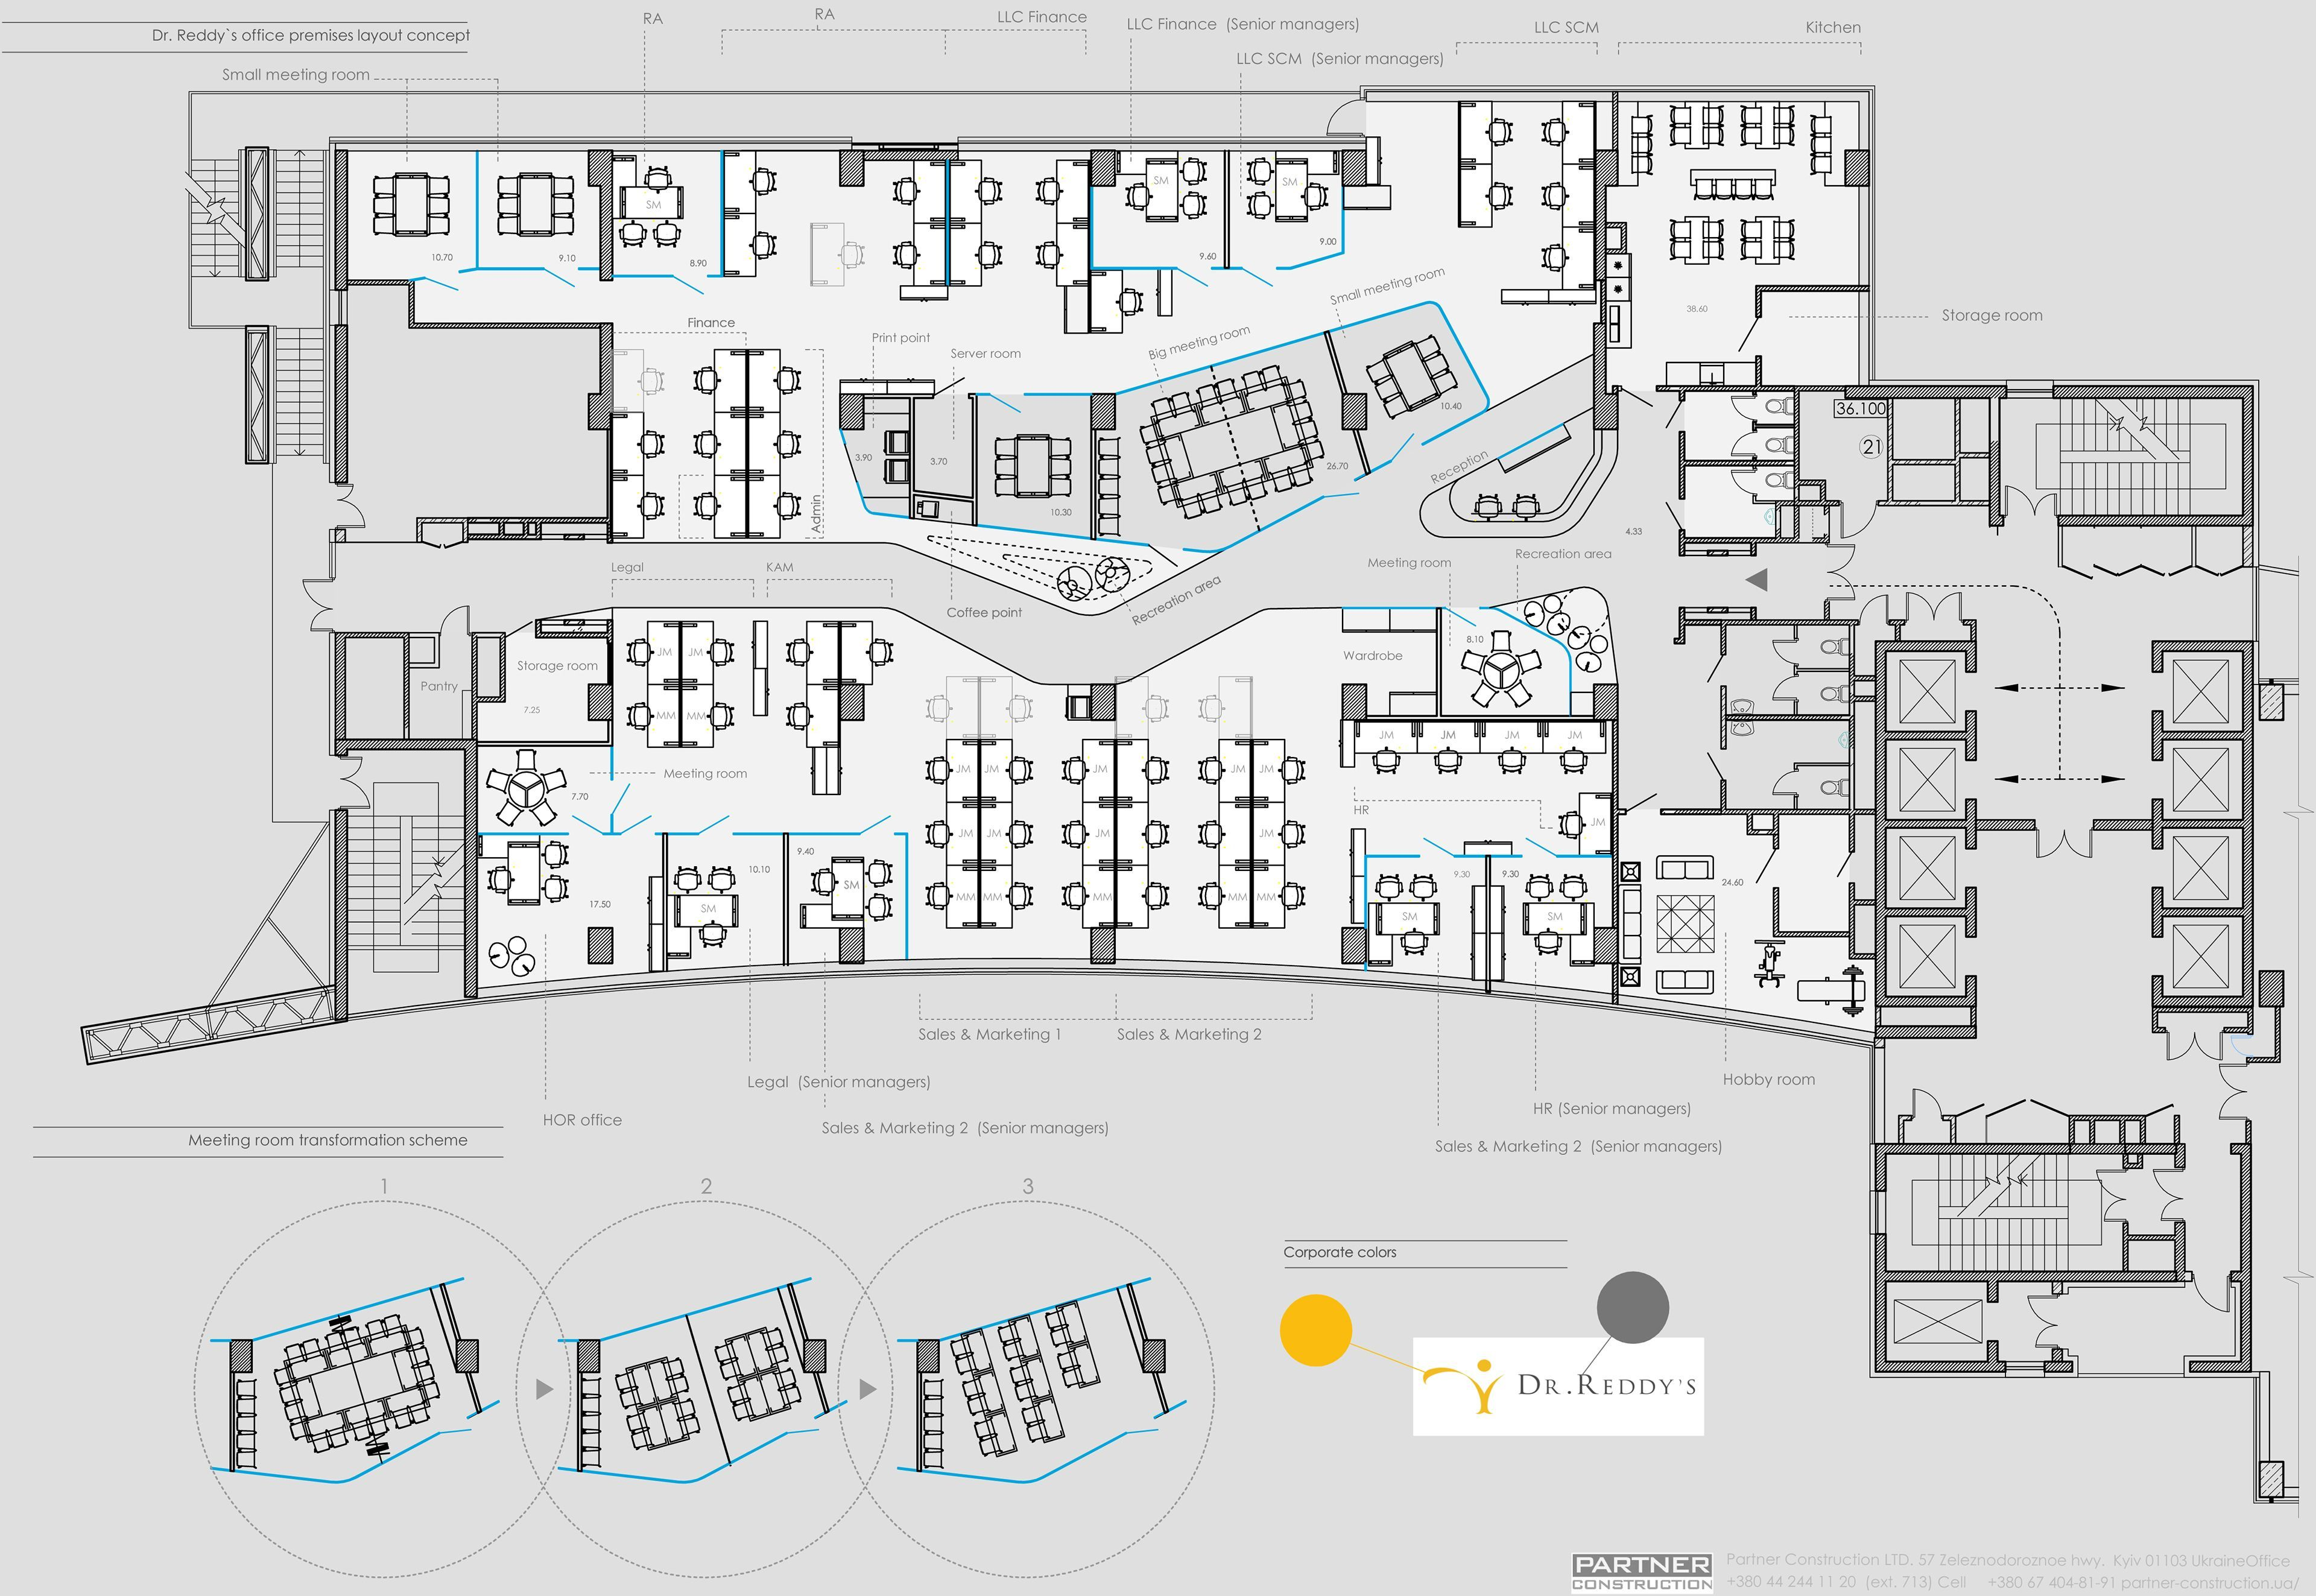 Office design concept | Office design concepts, Office ...